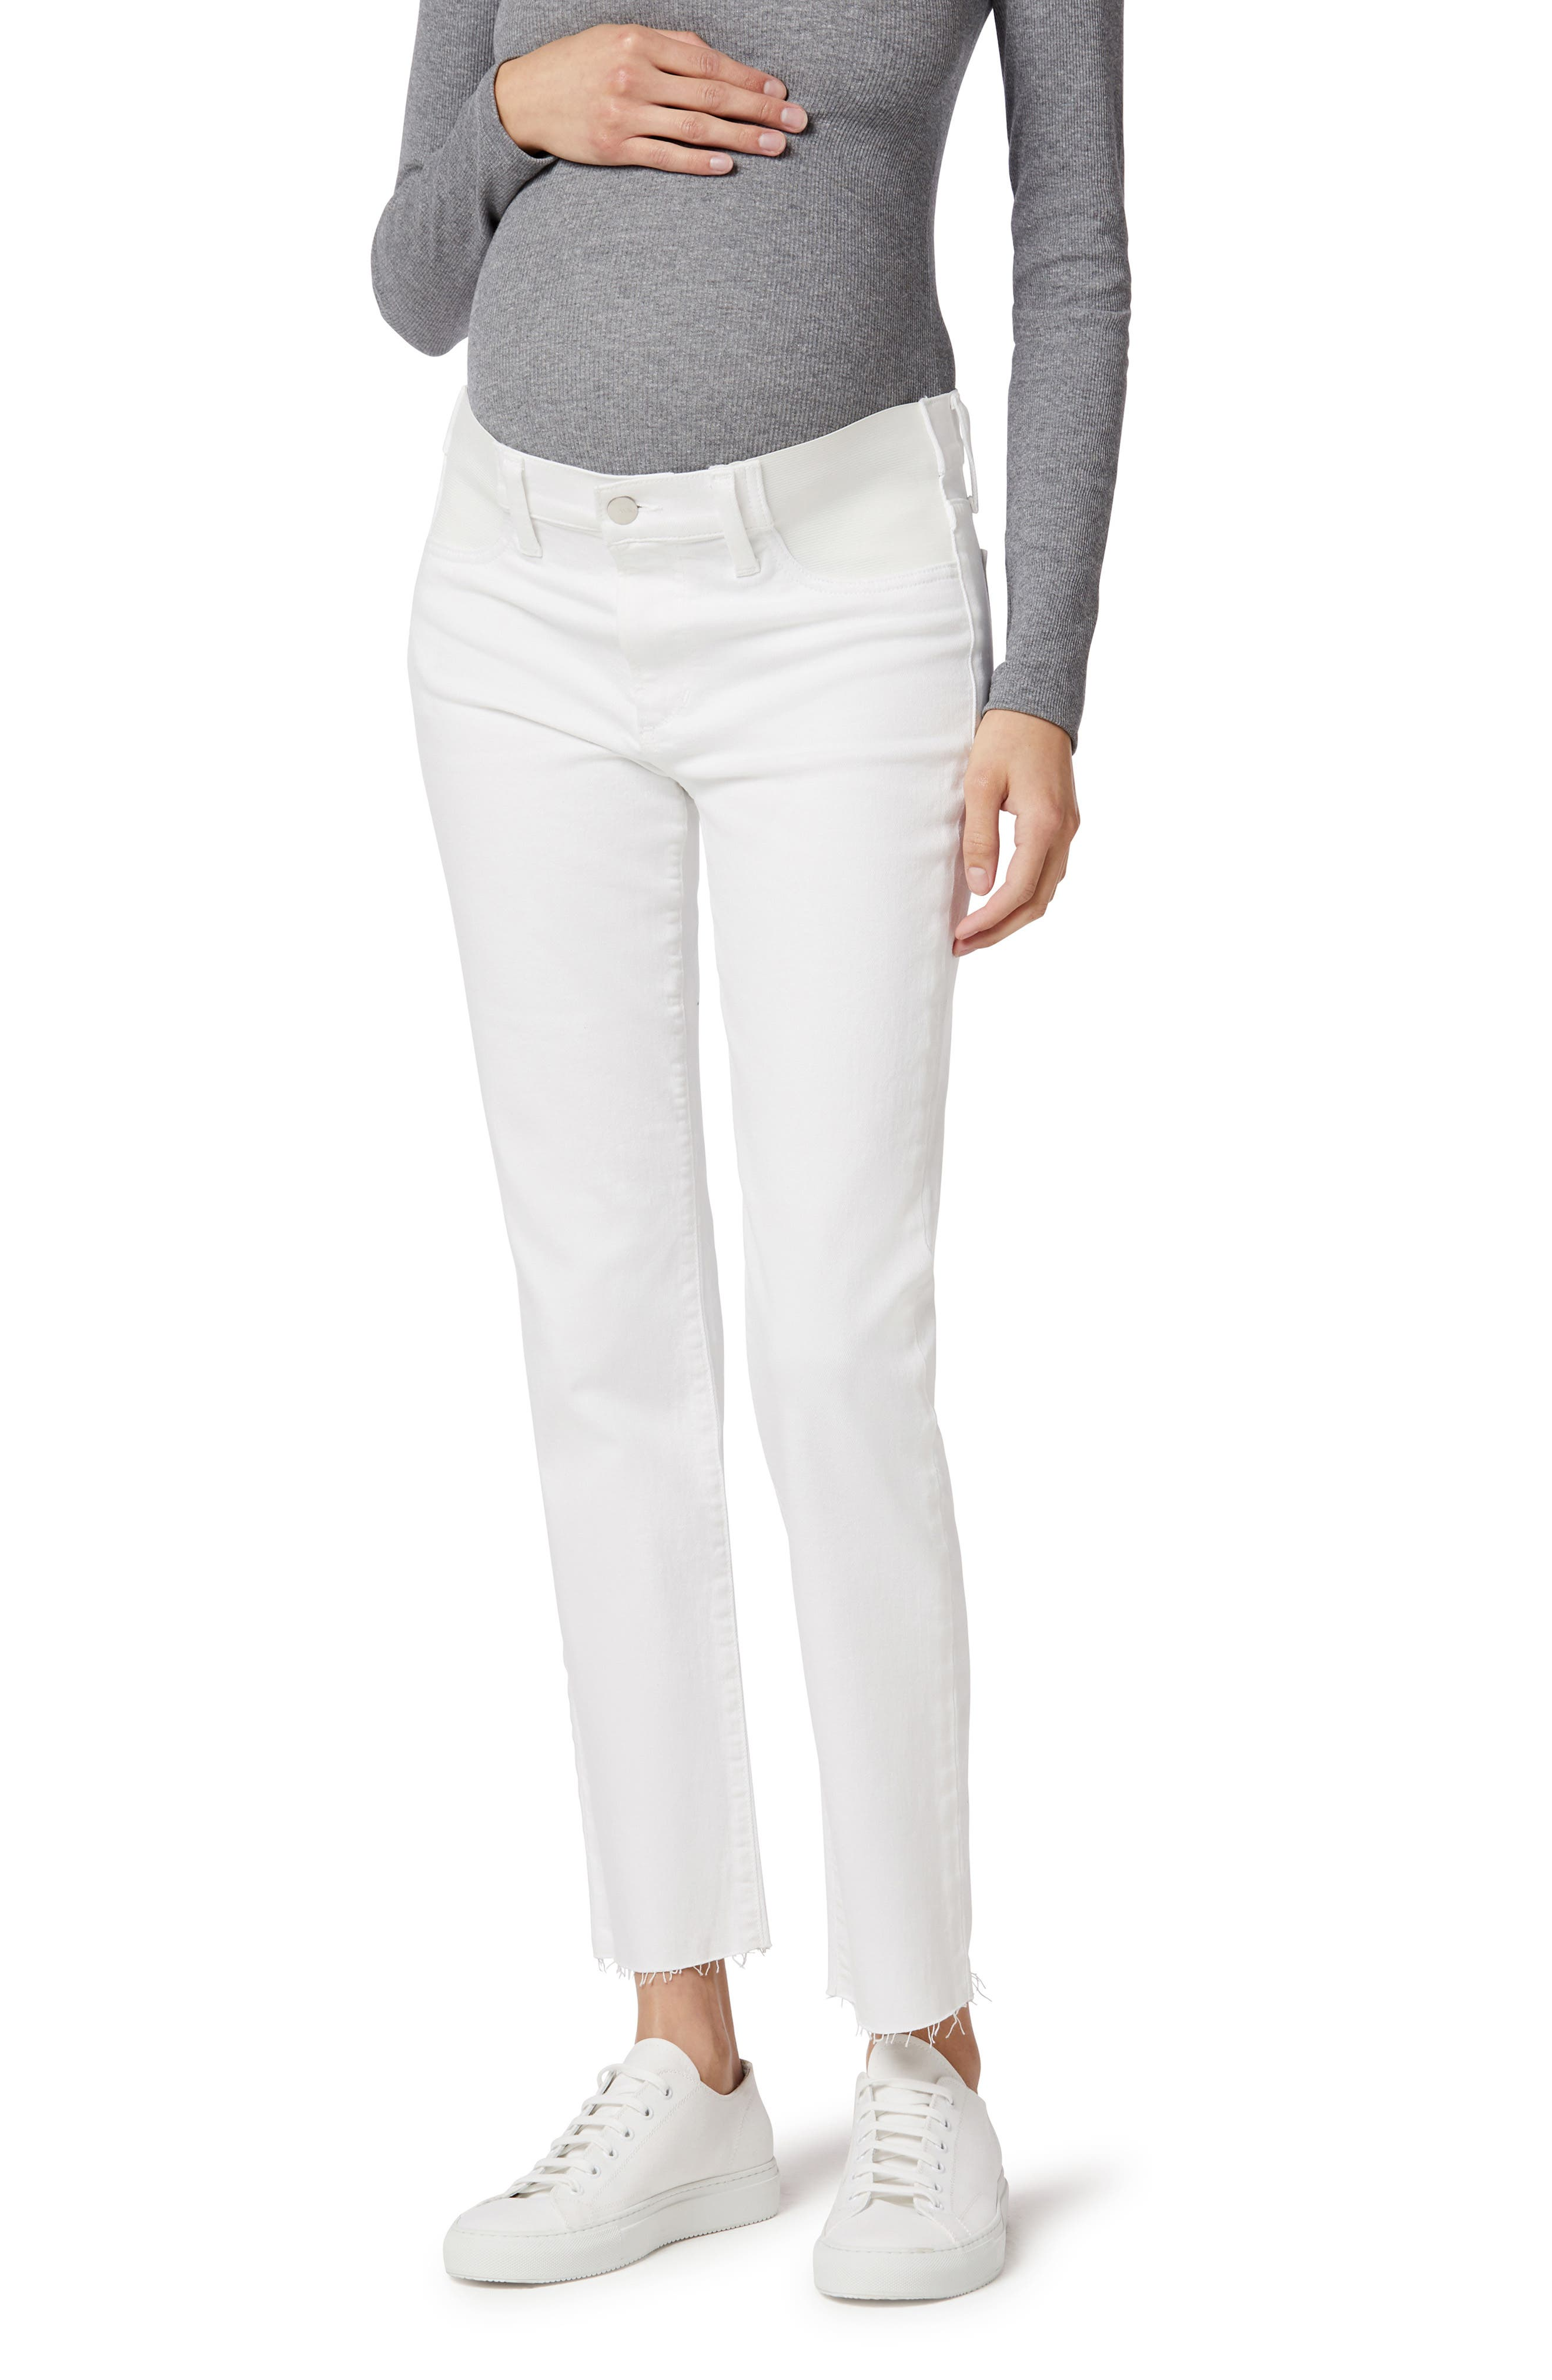 The Lara Fray Hem Ankle Maternity Jeans